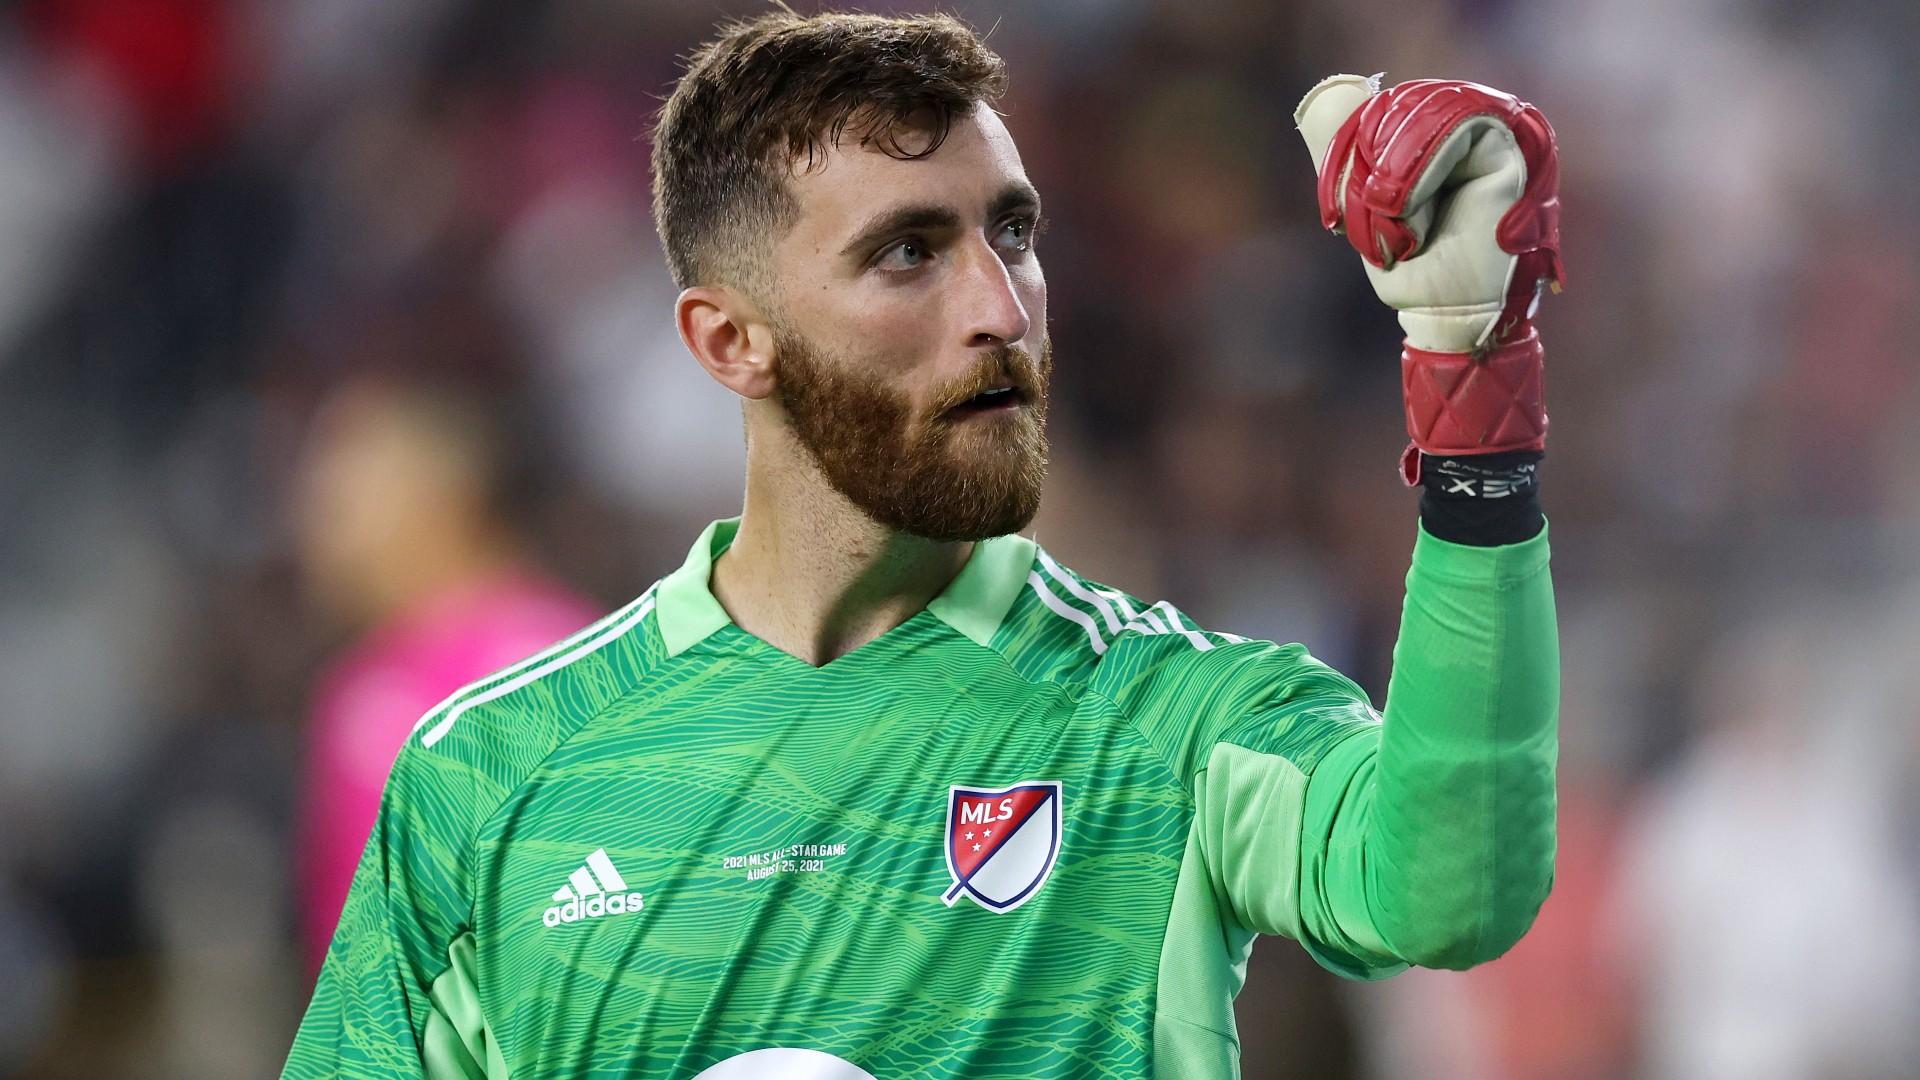 MLS vs. Liga MX All-Stars result, highlights: MLS wins first-ever matchup in penalty shootout